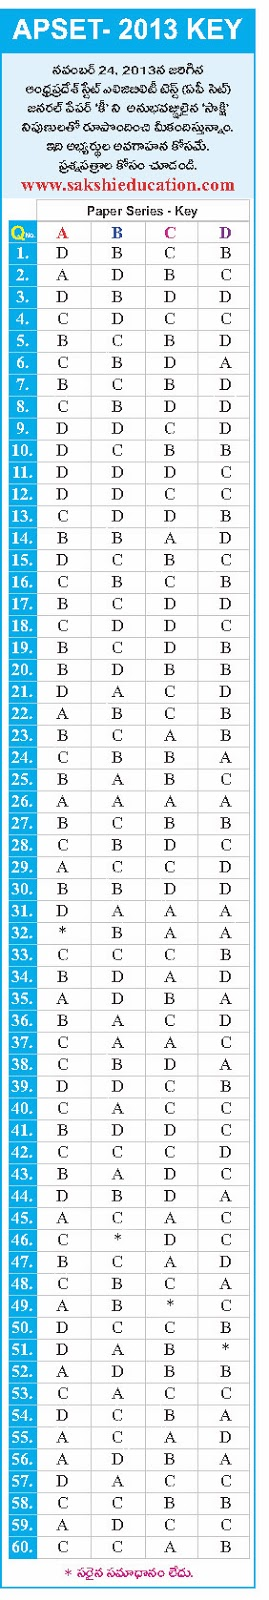 APSET 2013 Answer Key